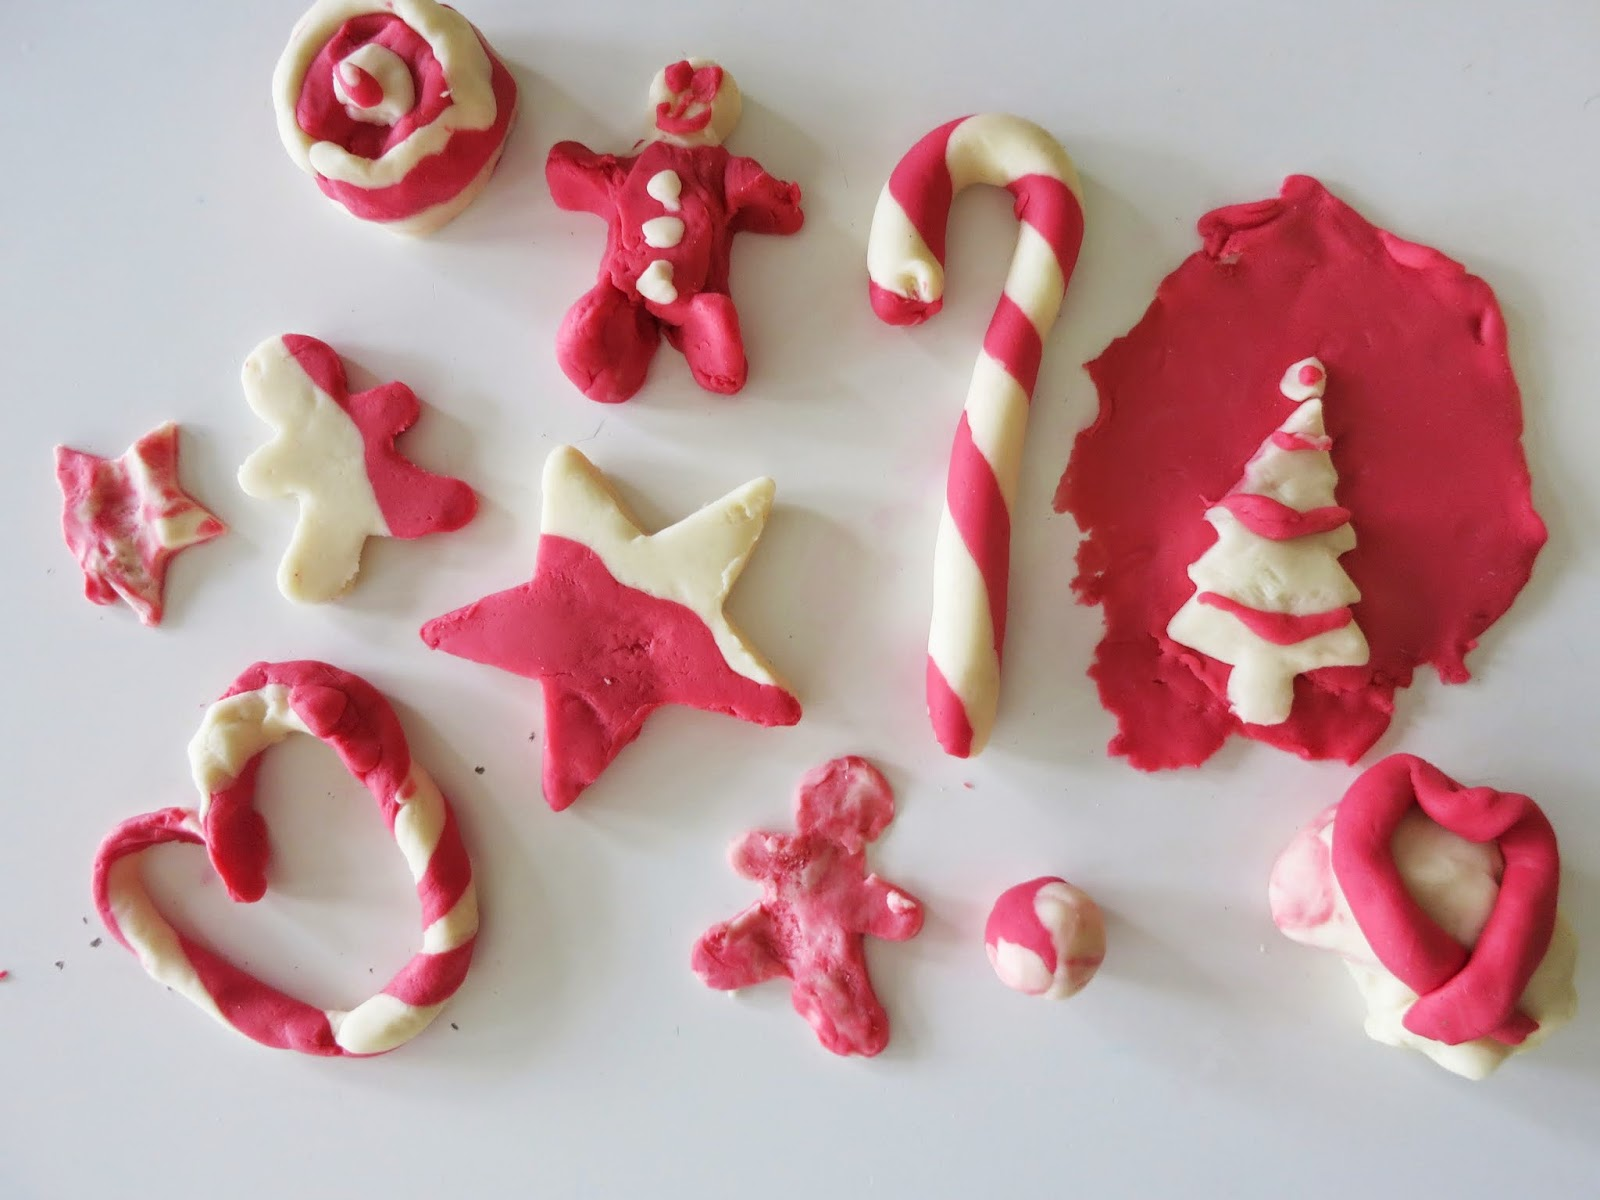 Candy Cane Playdough Invitation to Play